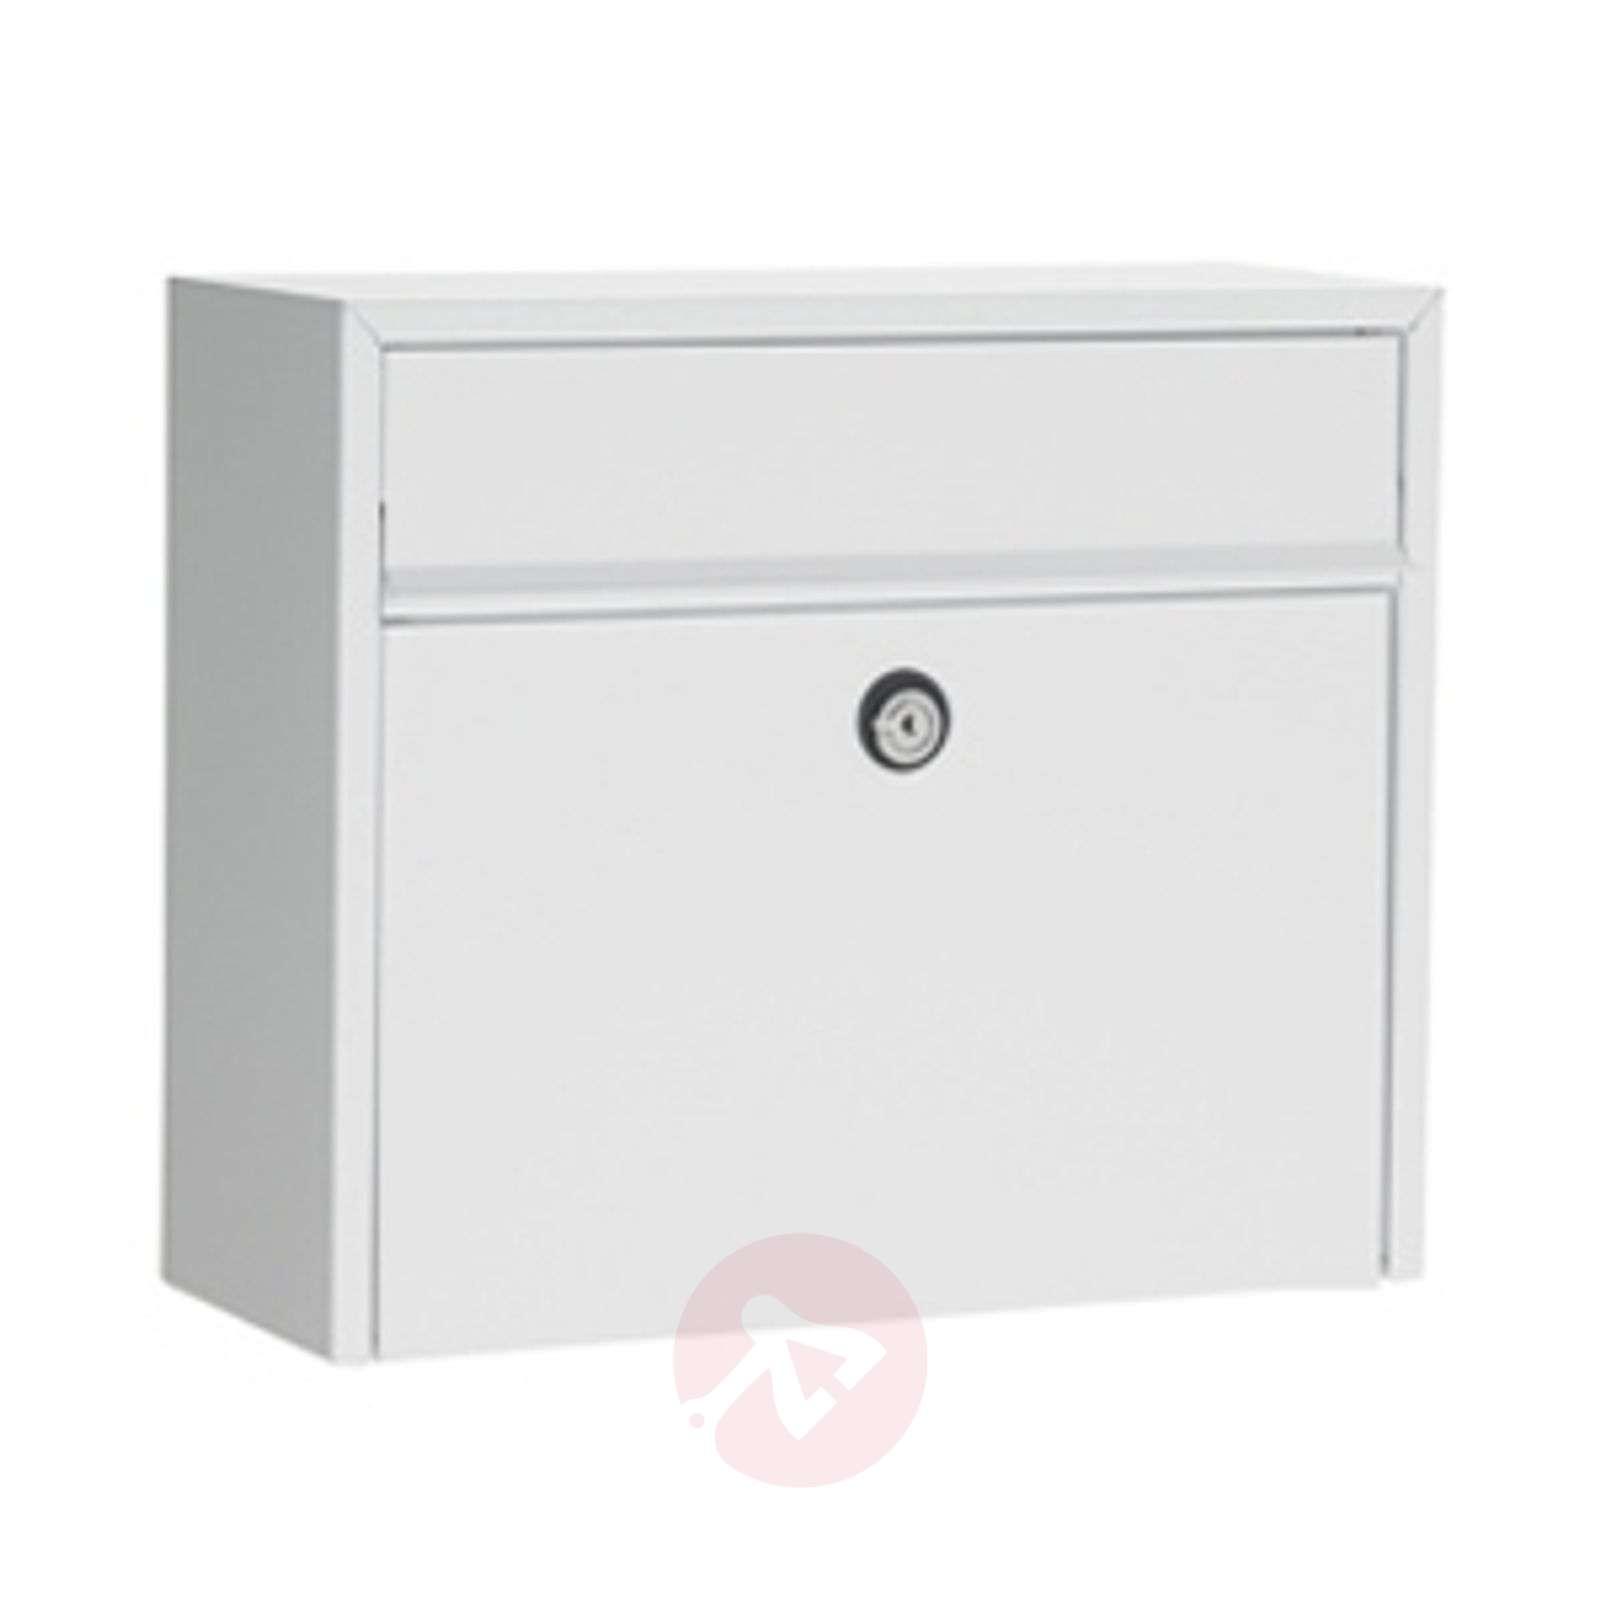 Simple letterbox LT150-1045037X-01